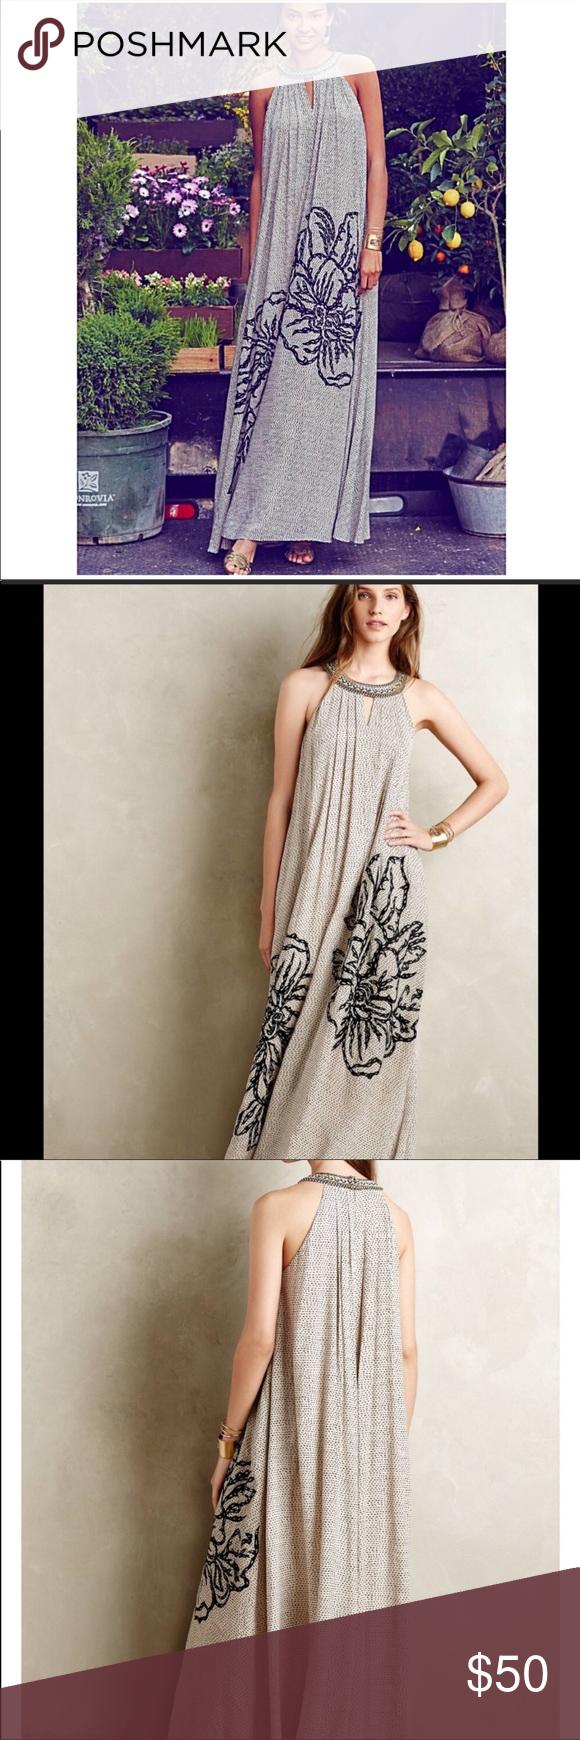 20+ Anthropologie ranna gill maxi dress trends